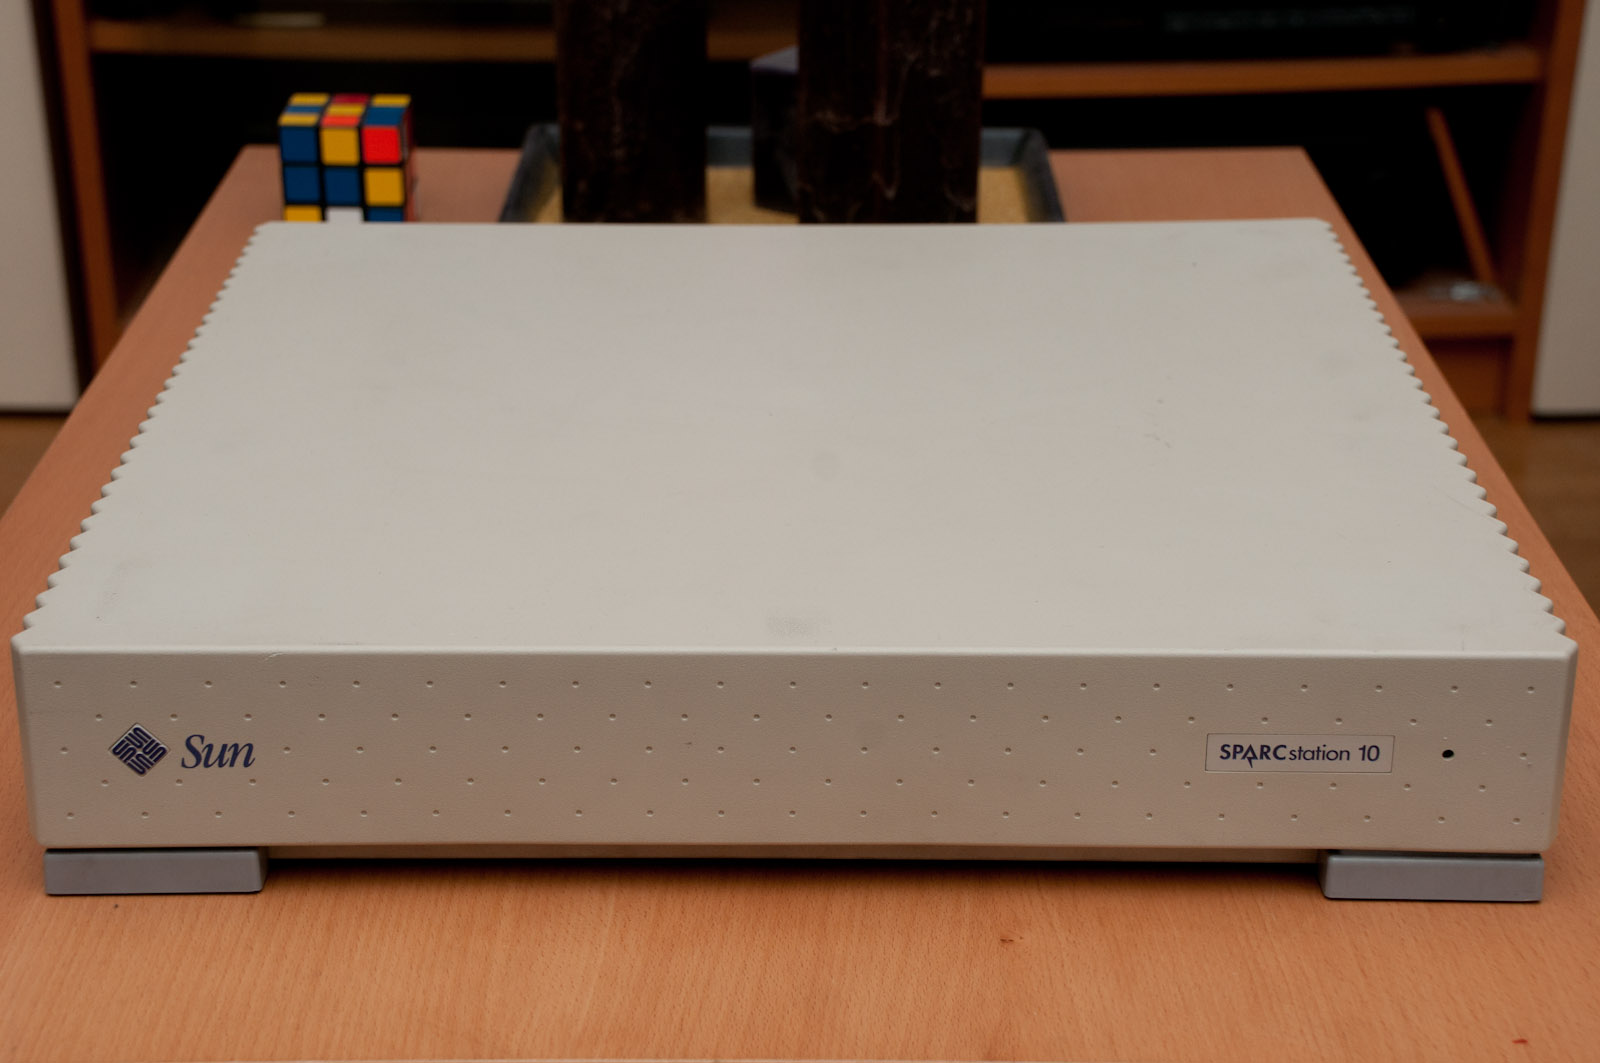 Sun SPARCstation 10